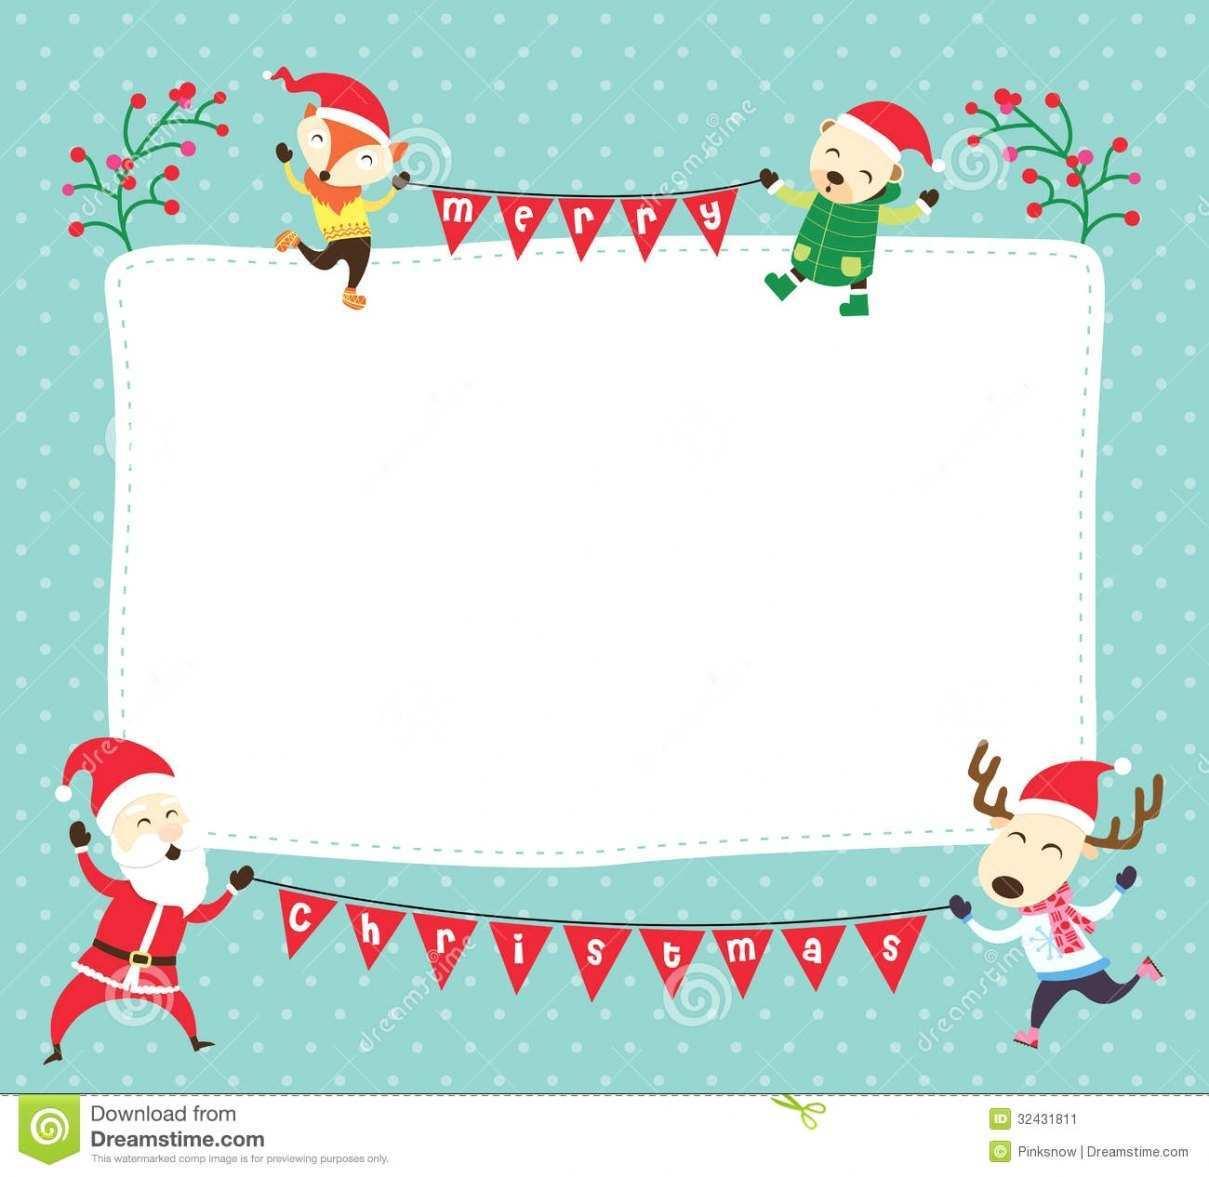 16 Printable Christmas Card Template Word 2010 Layouts for Christmas Card Template Word 2010